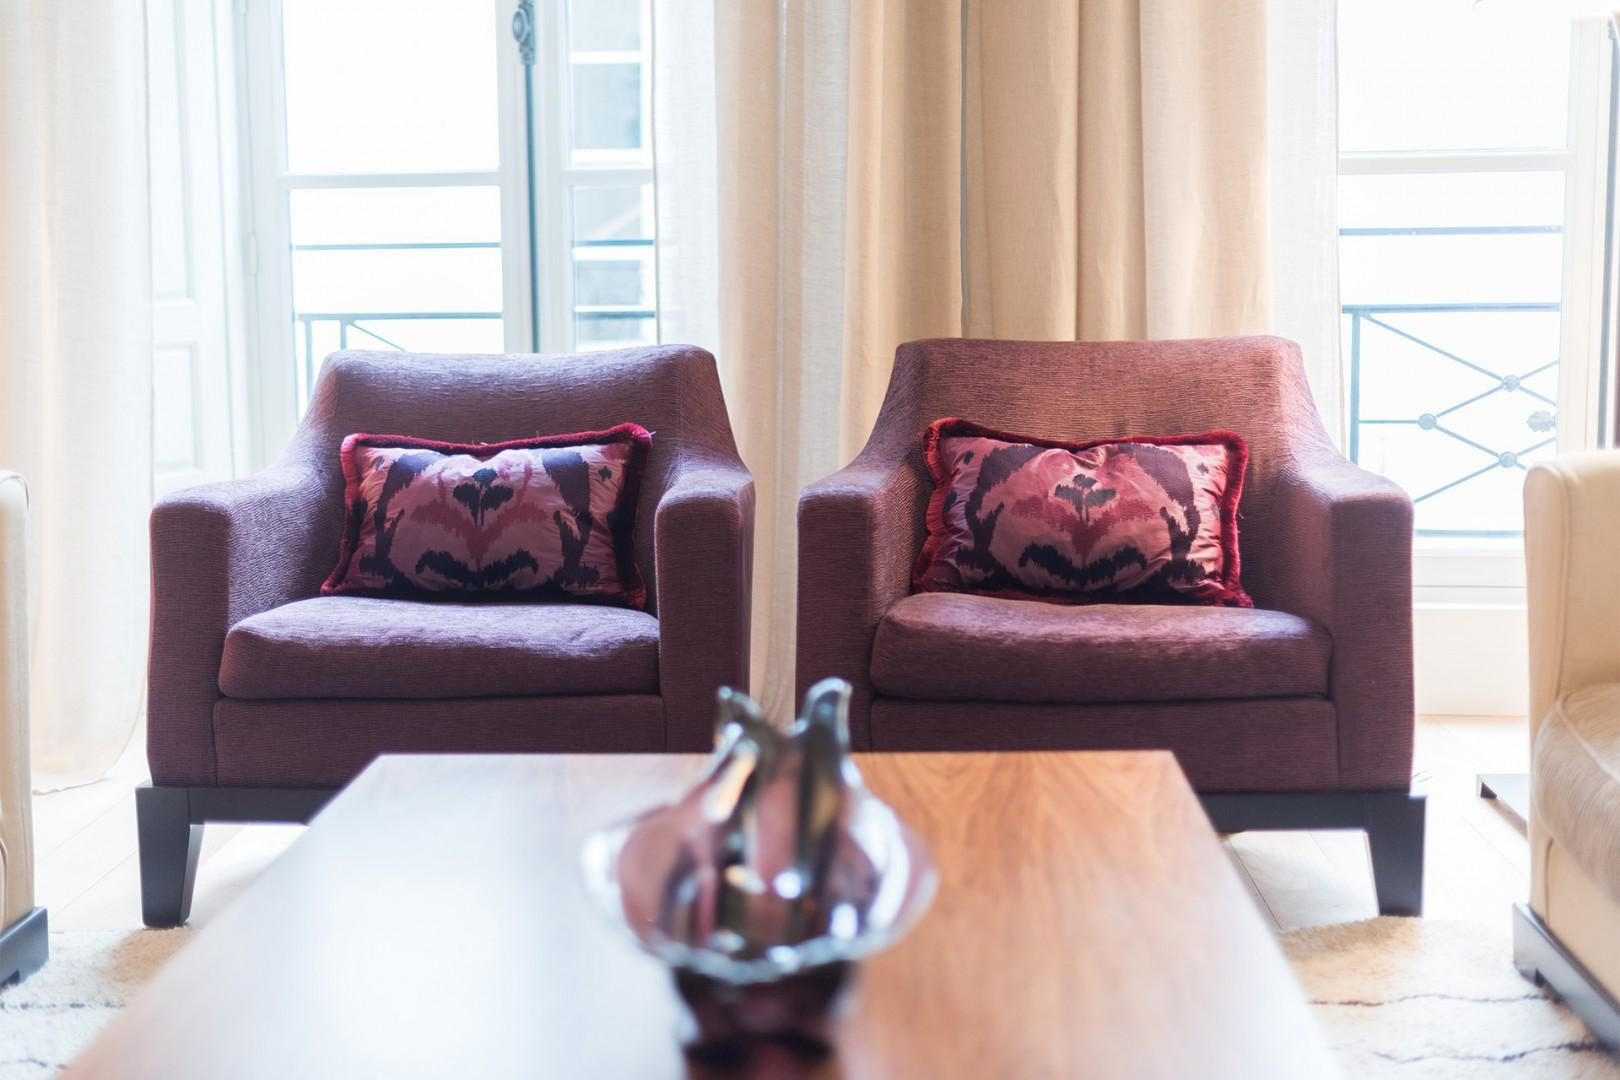 Enjoy a thoroughly modern stay at the Savigny.